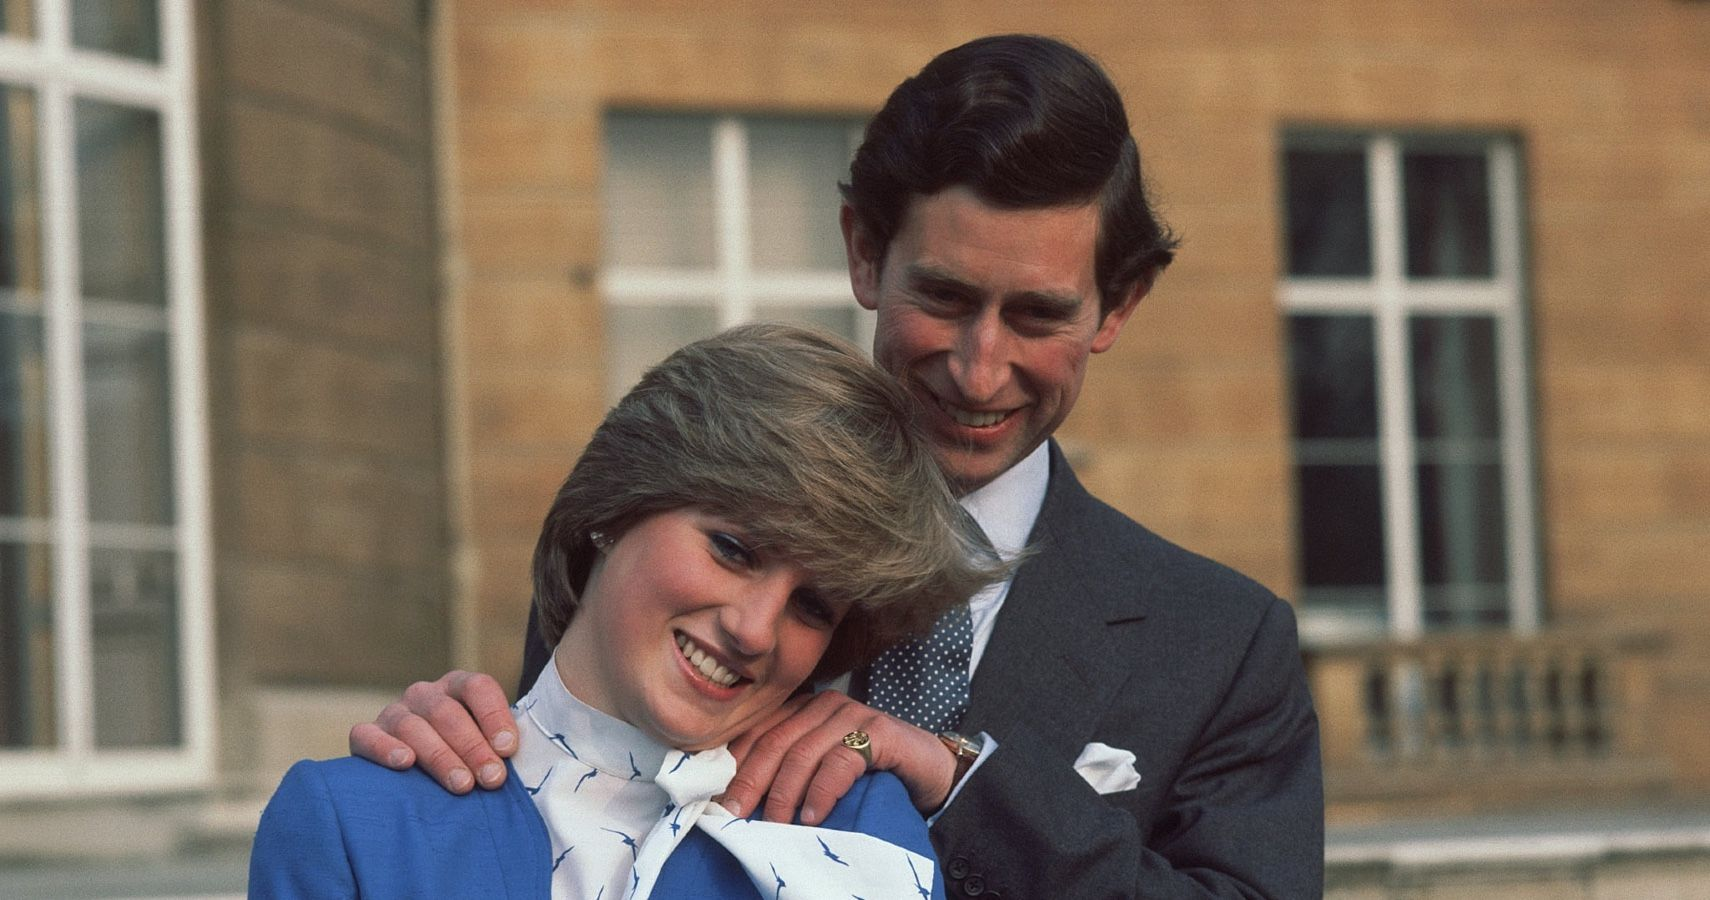 'The Crown' New Photos Prompt Fans To Discuss Secrets Behind Diana's Portrait